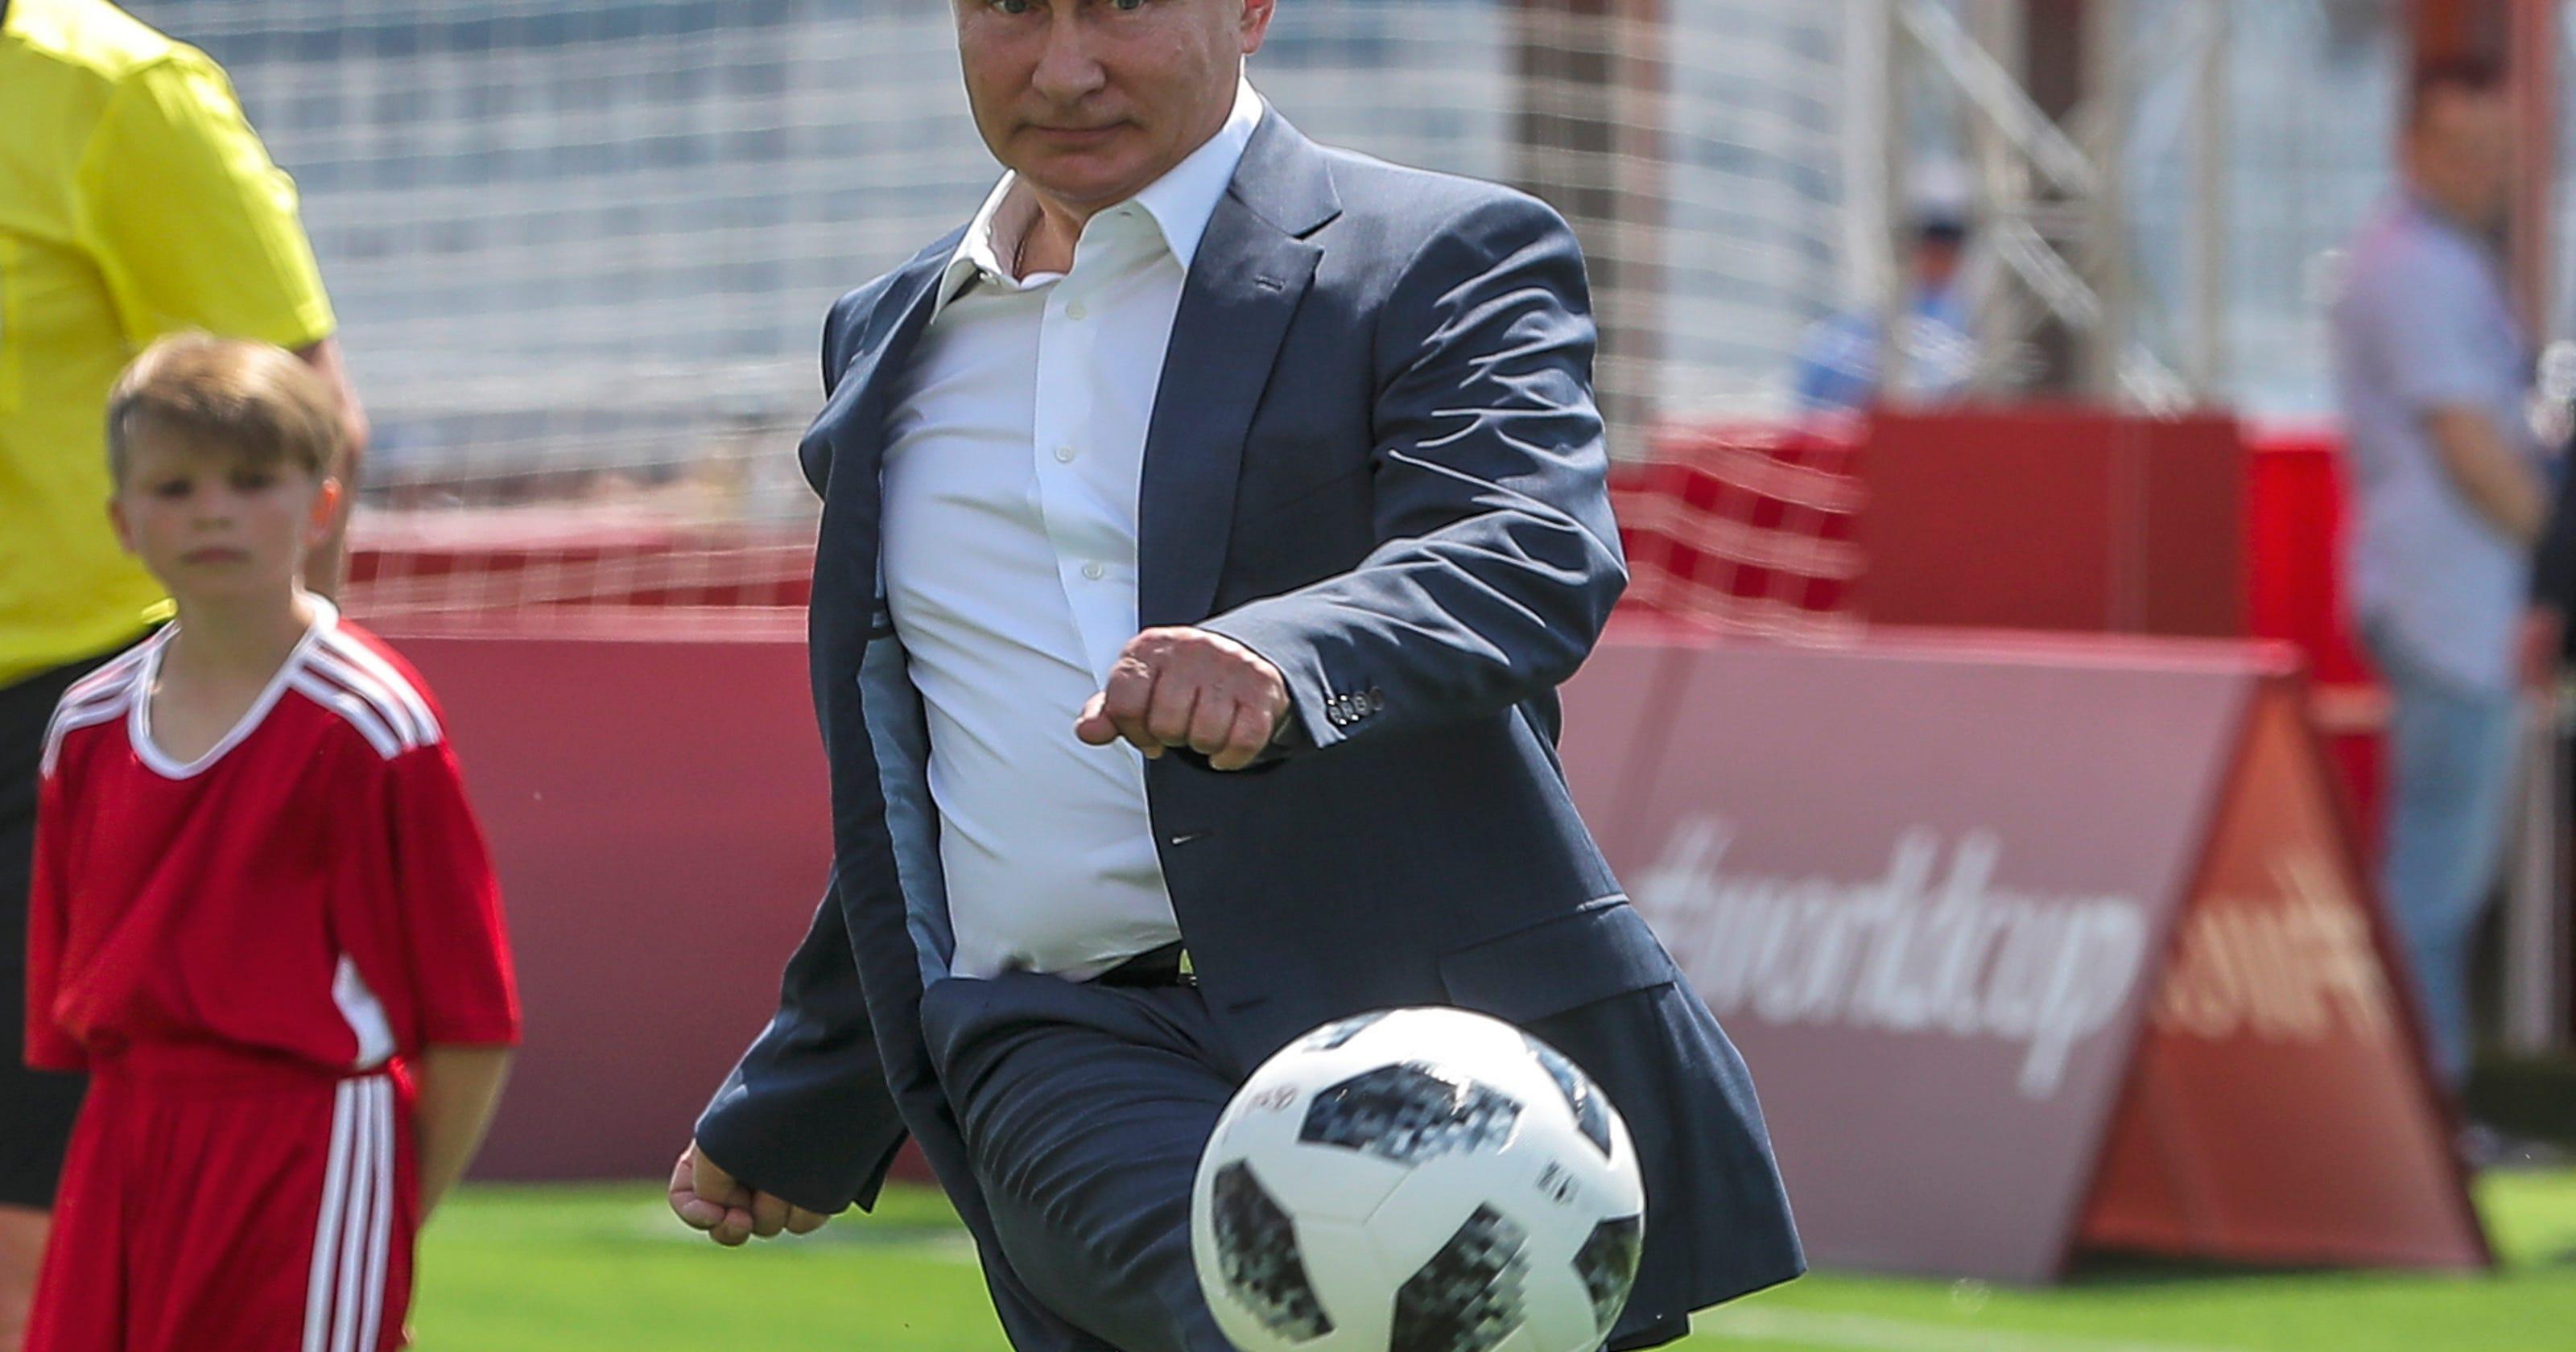 World Cup 2018: Vladimir Putin is the winner of this tournament